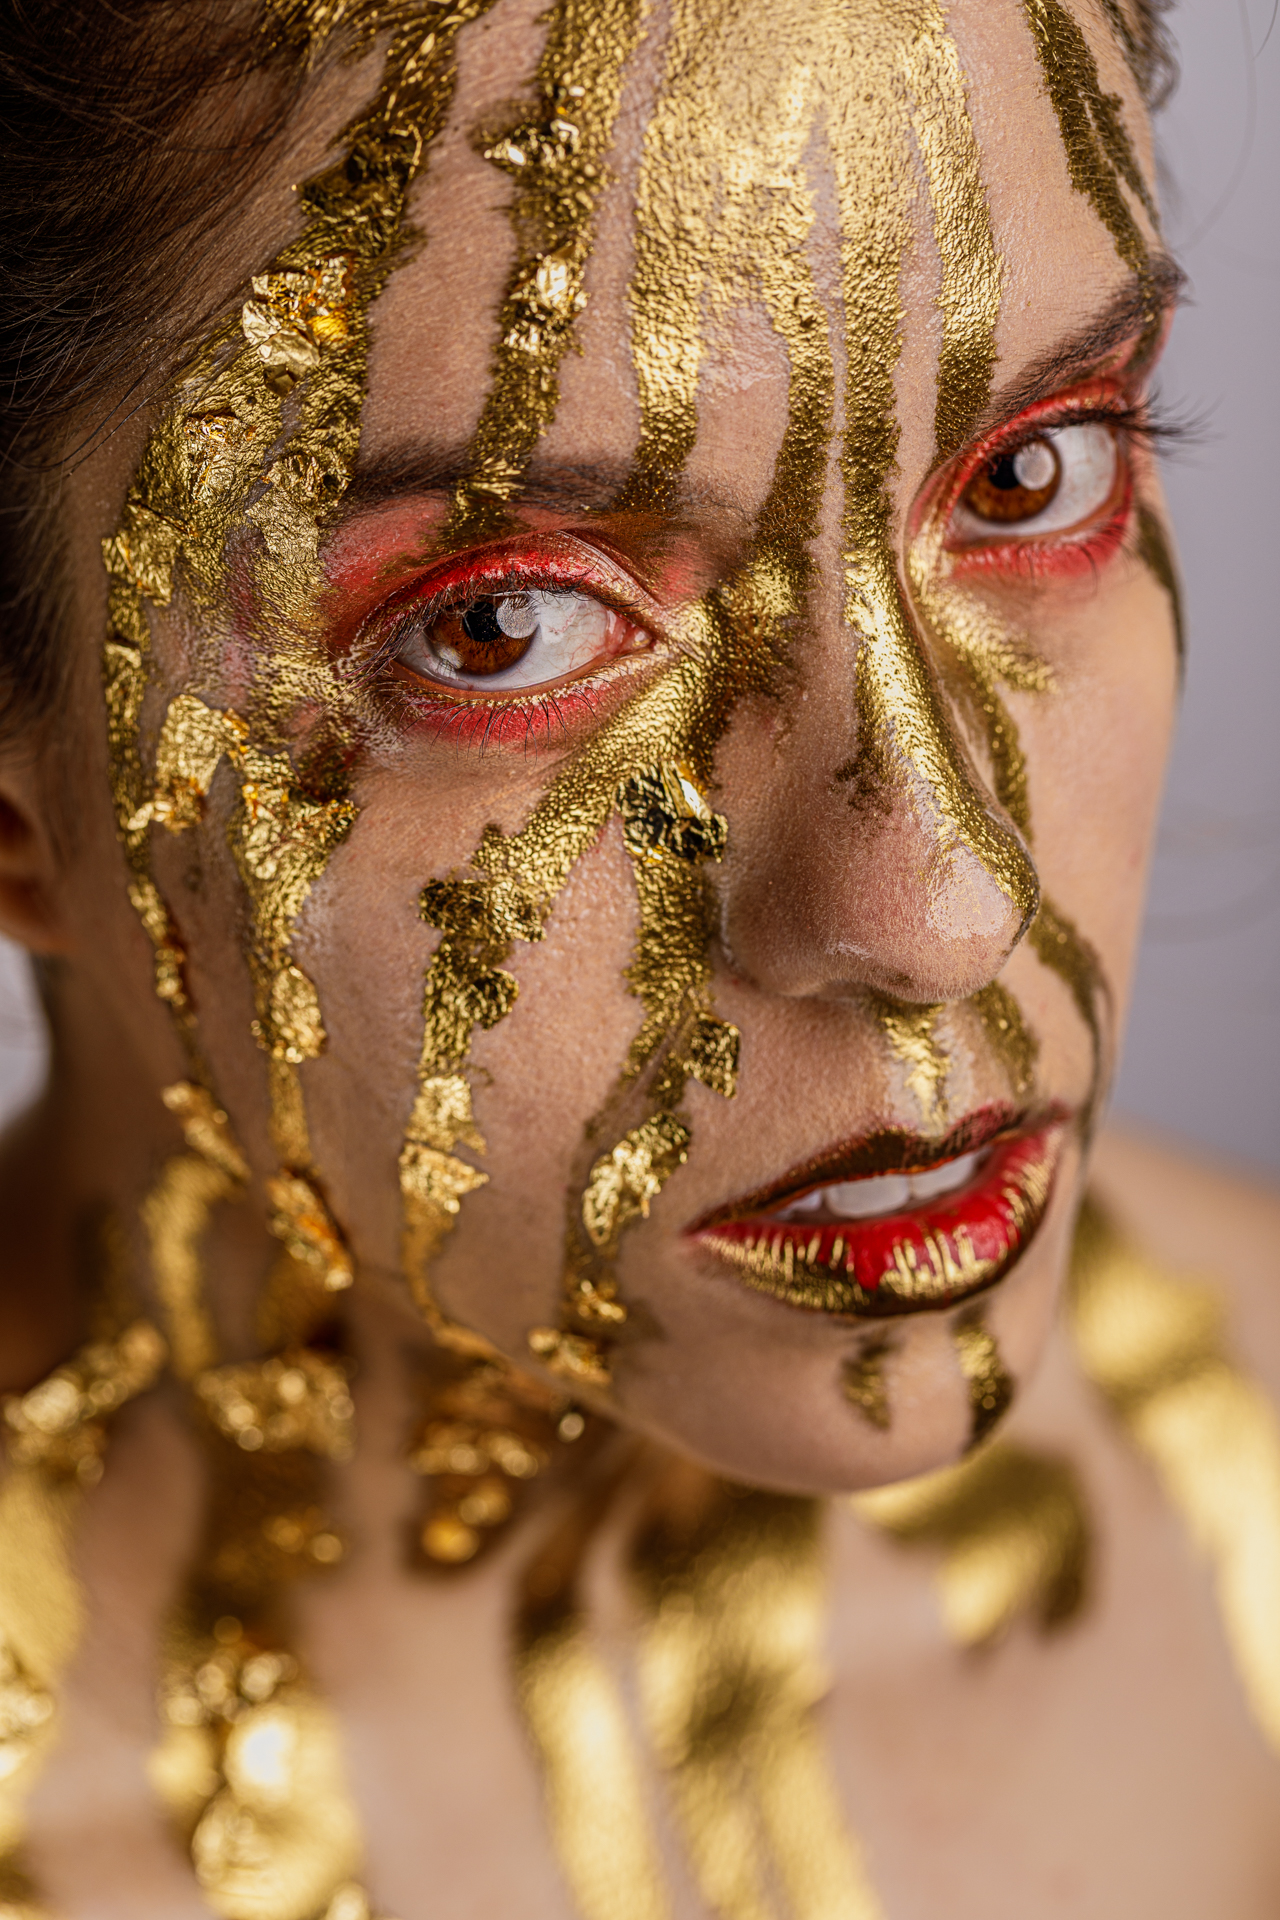 CFrenette-Julie-maquillage-9